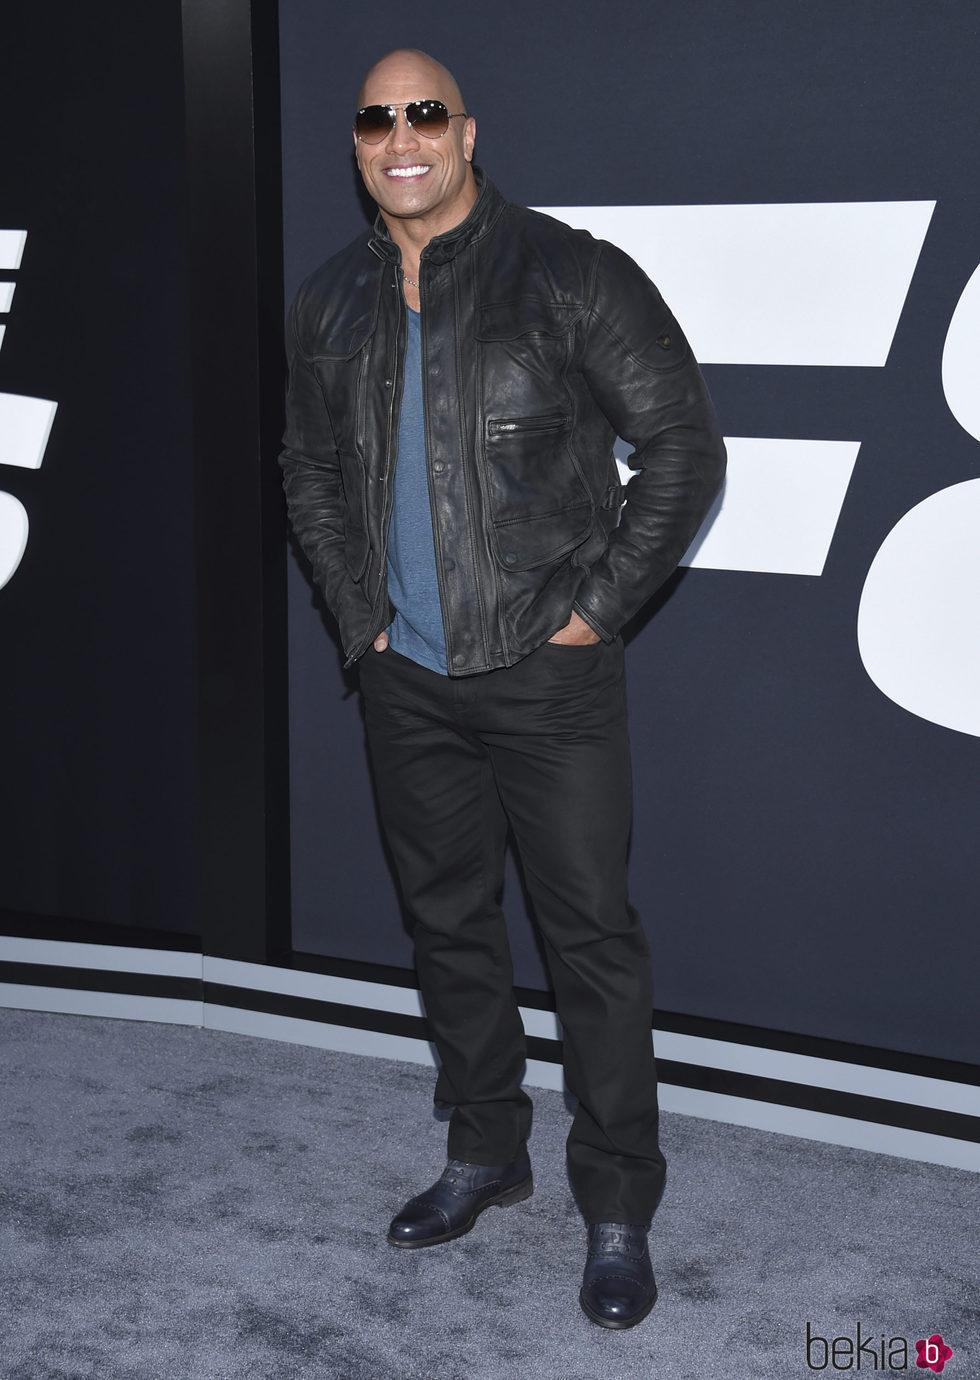 Dwayne Johnson en la Premiere de 'Fast & Furious 8' en Nueva York